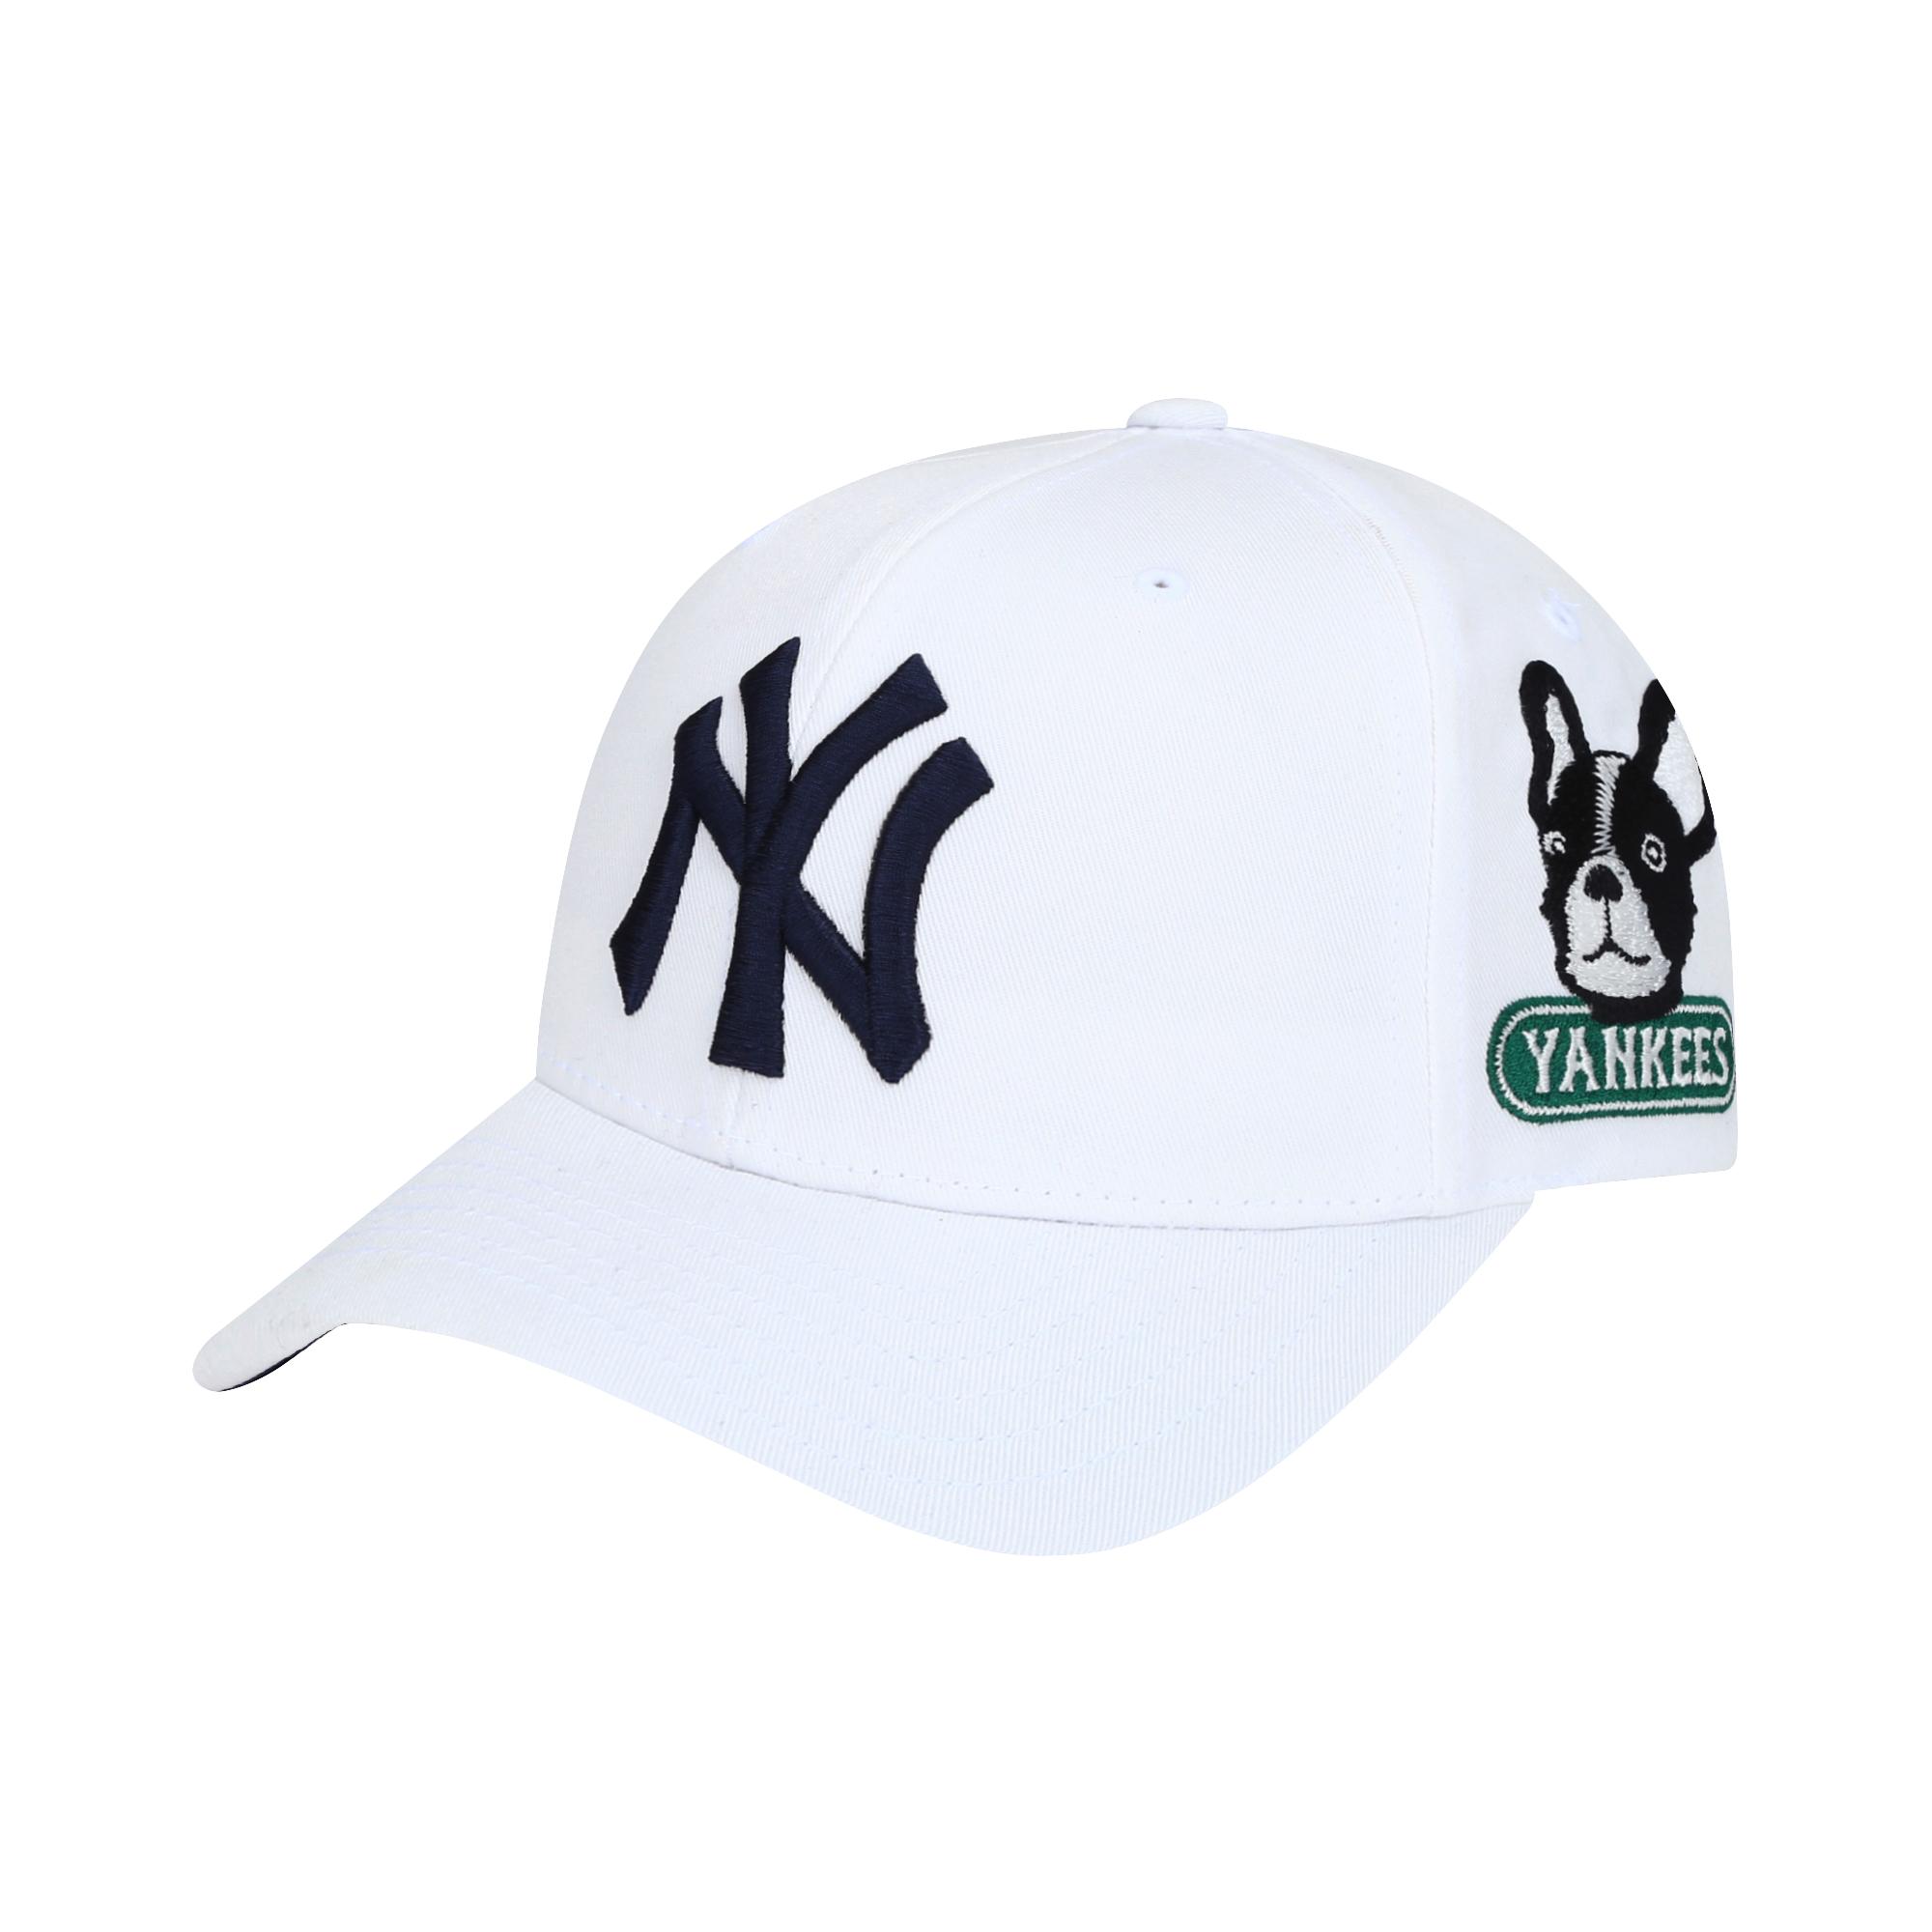 NEW YORK YANKEES BARK ADJUSTABLE CAP